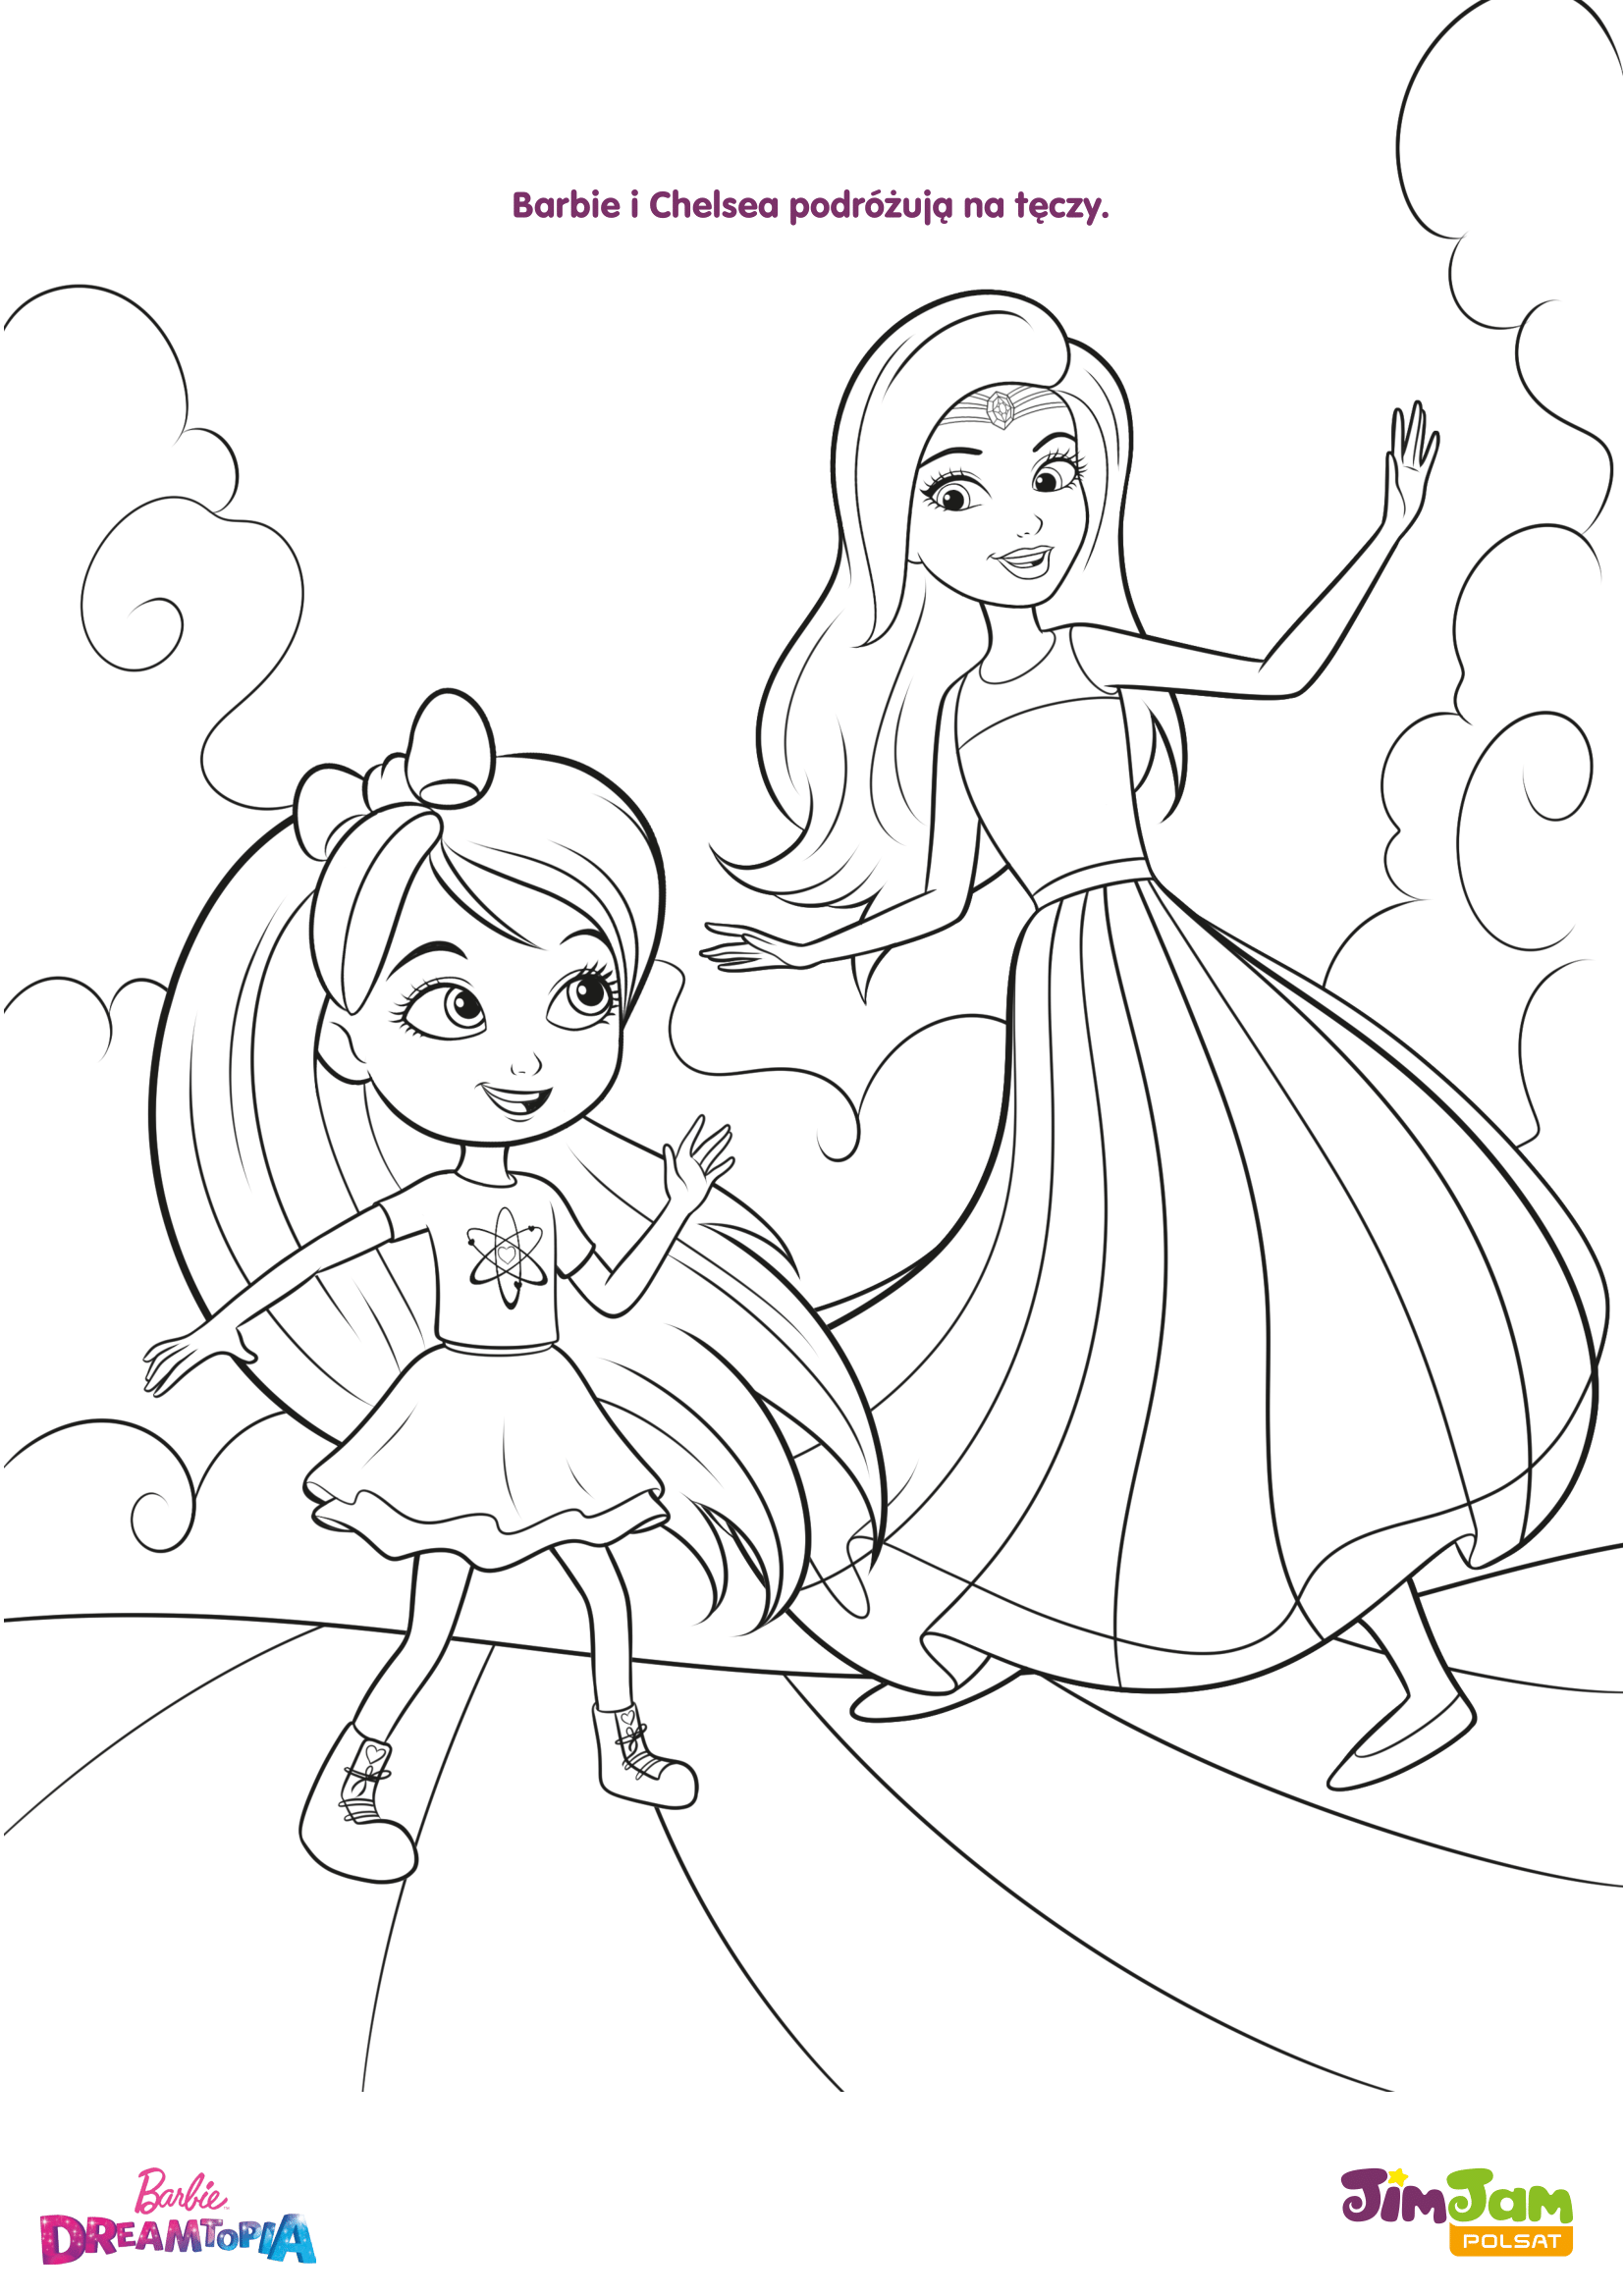 Barbie i Chelsea na tęczy – Barbie Dreamtopia POLSAT JimJam